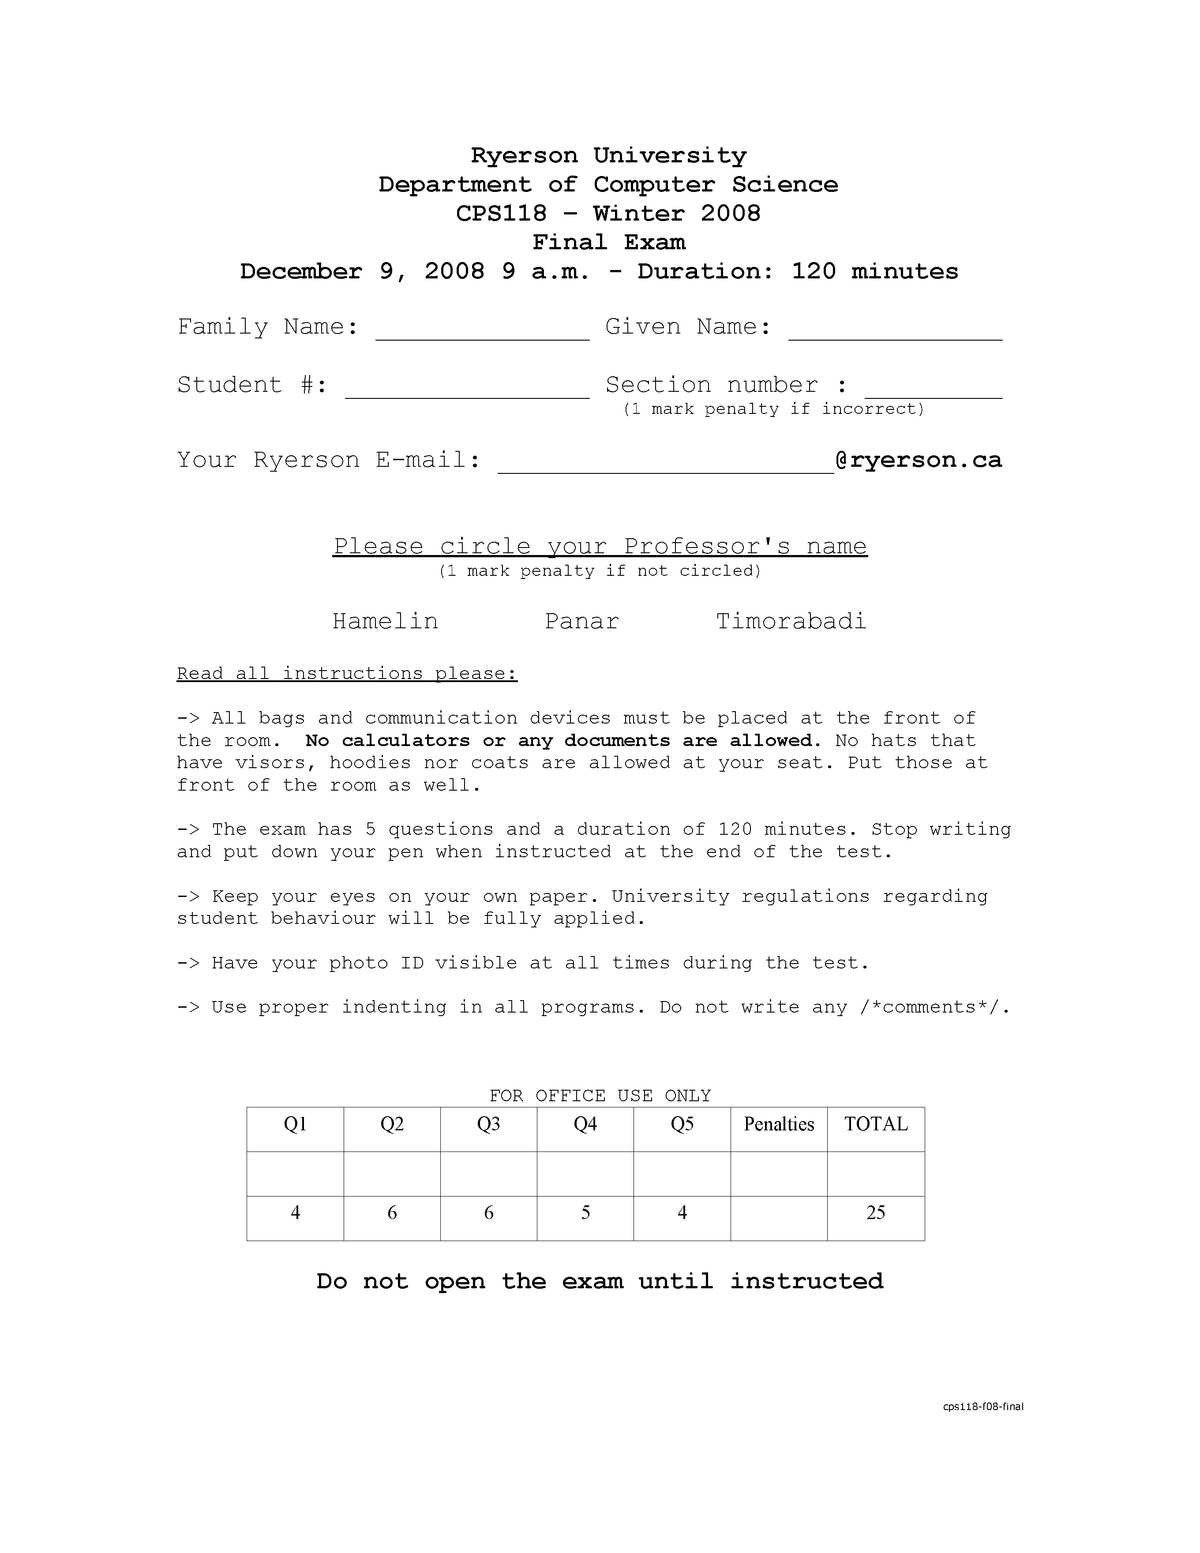 Exam 9 December 2008, questions - - Ryerson - StuDocu